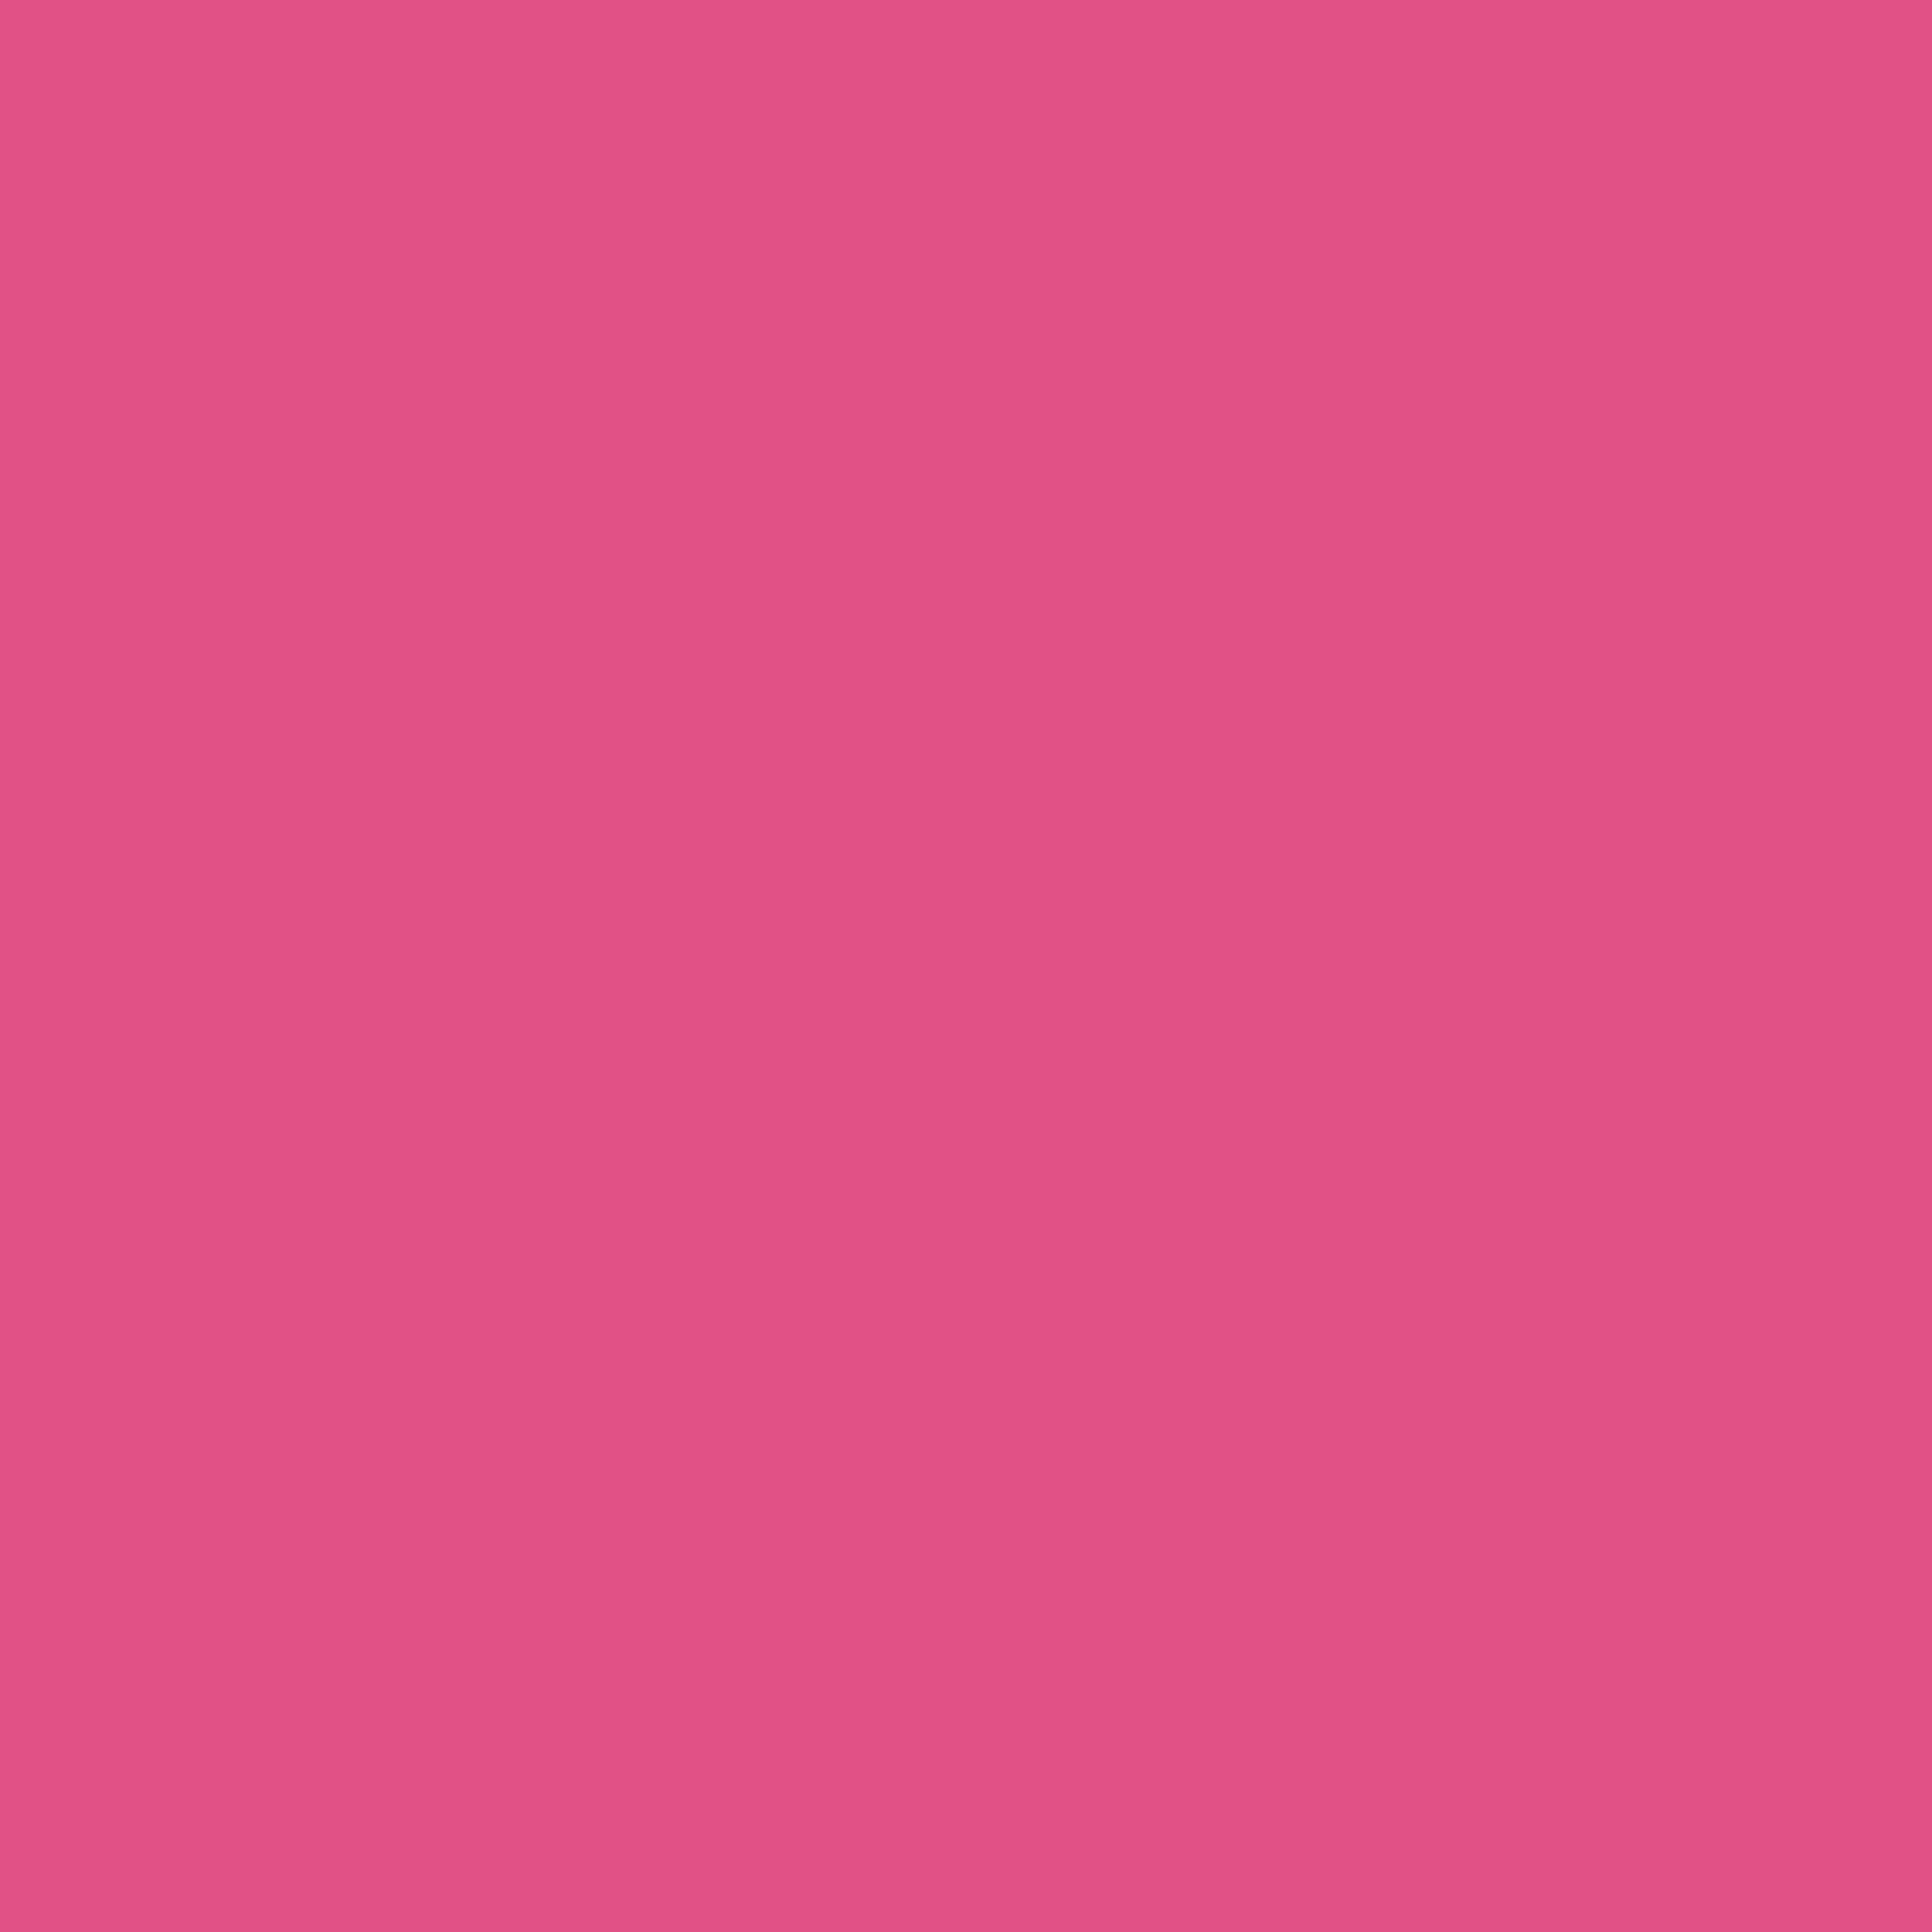 3600x3600 Fandango Pink Solid Color Background